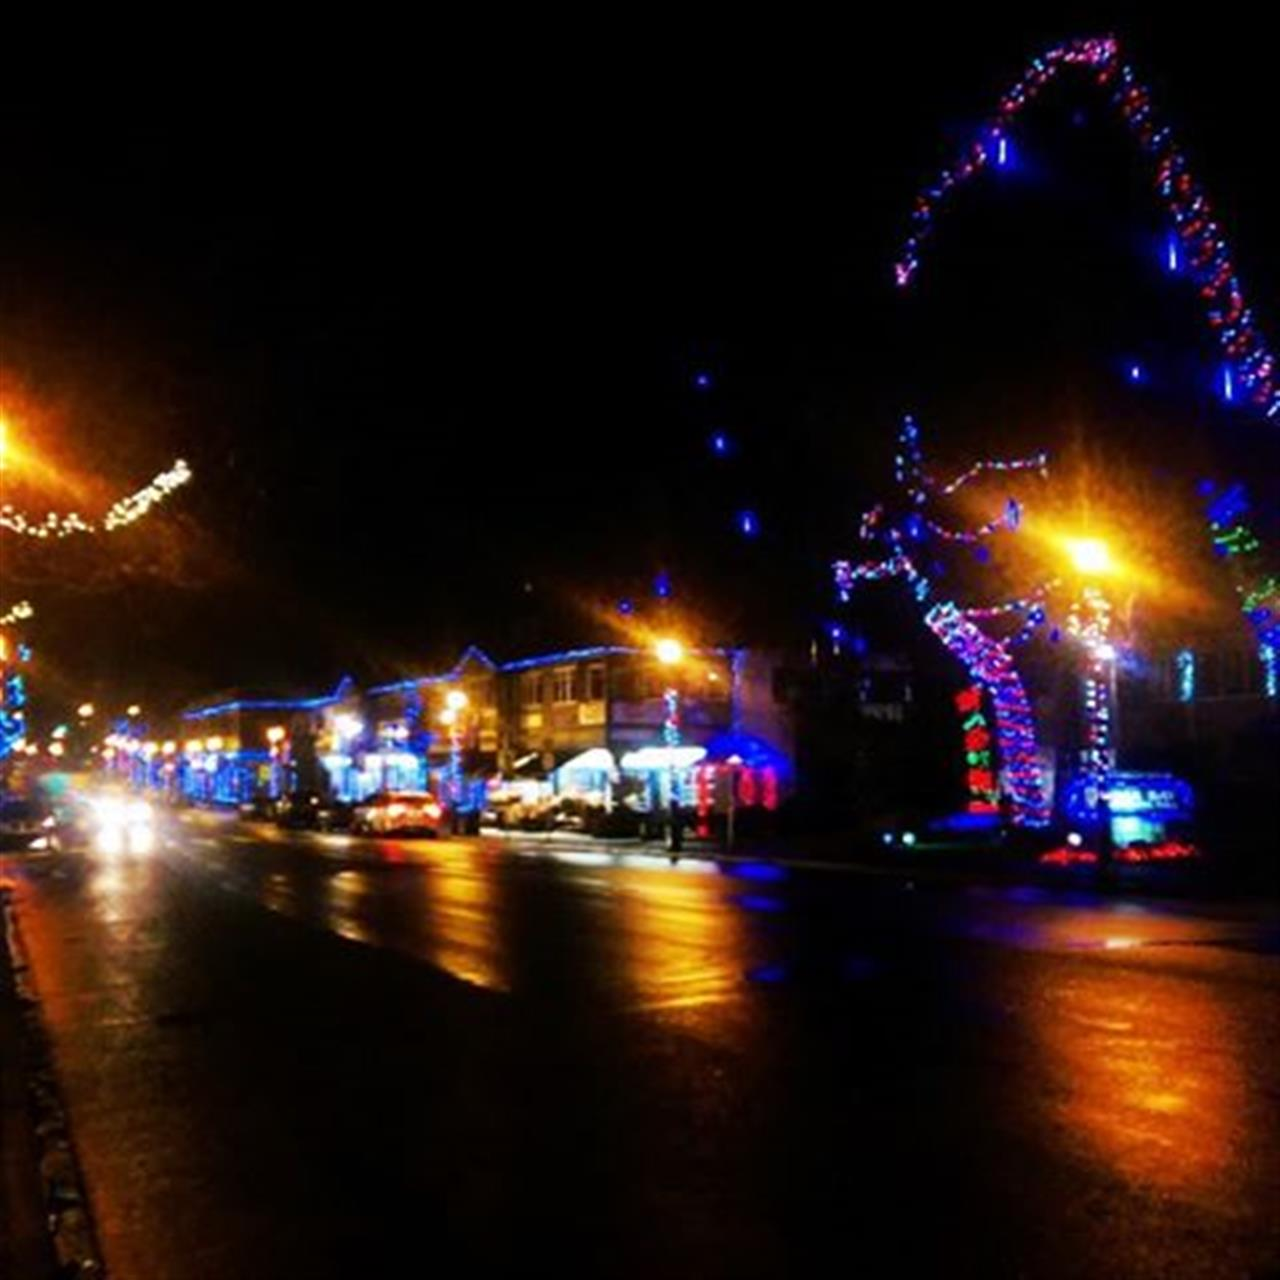 #christmaslights #festive #oakbay #leadingrelocal #dfhrealestate #realestate